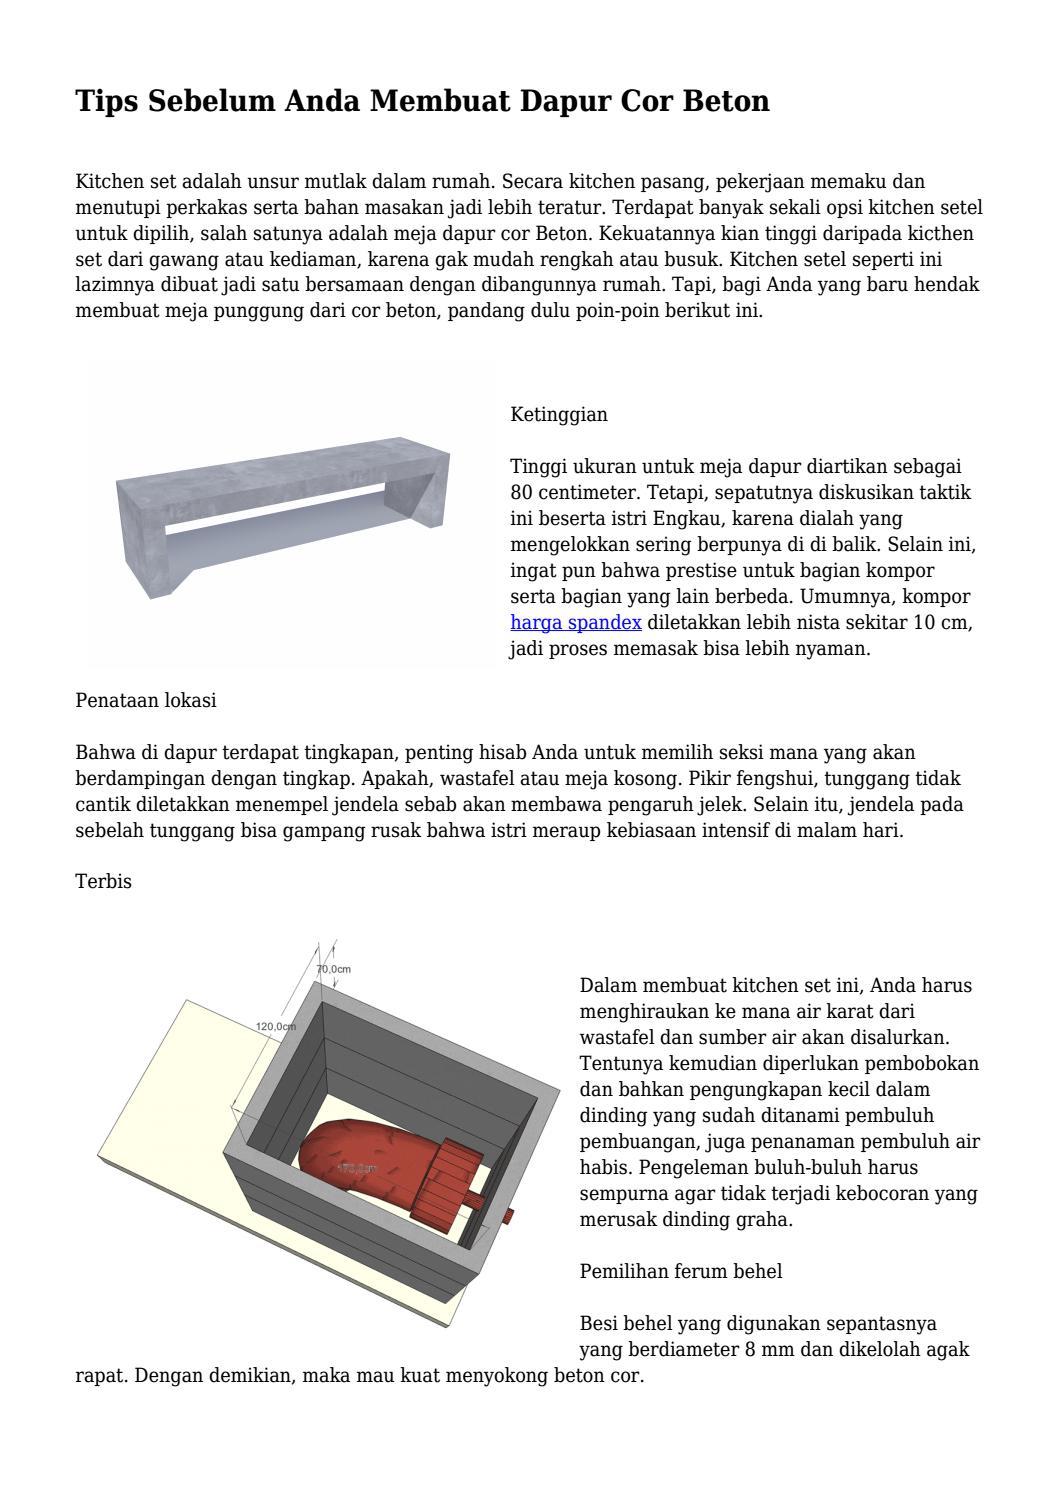 Tips Sebelum Anda Membuat Dapur Cor Beton By